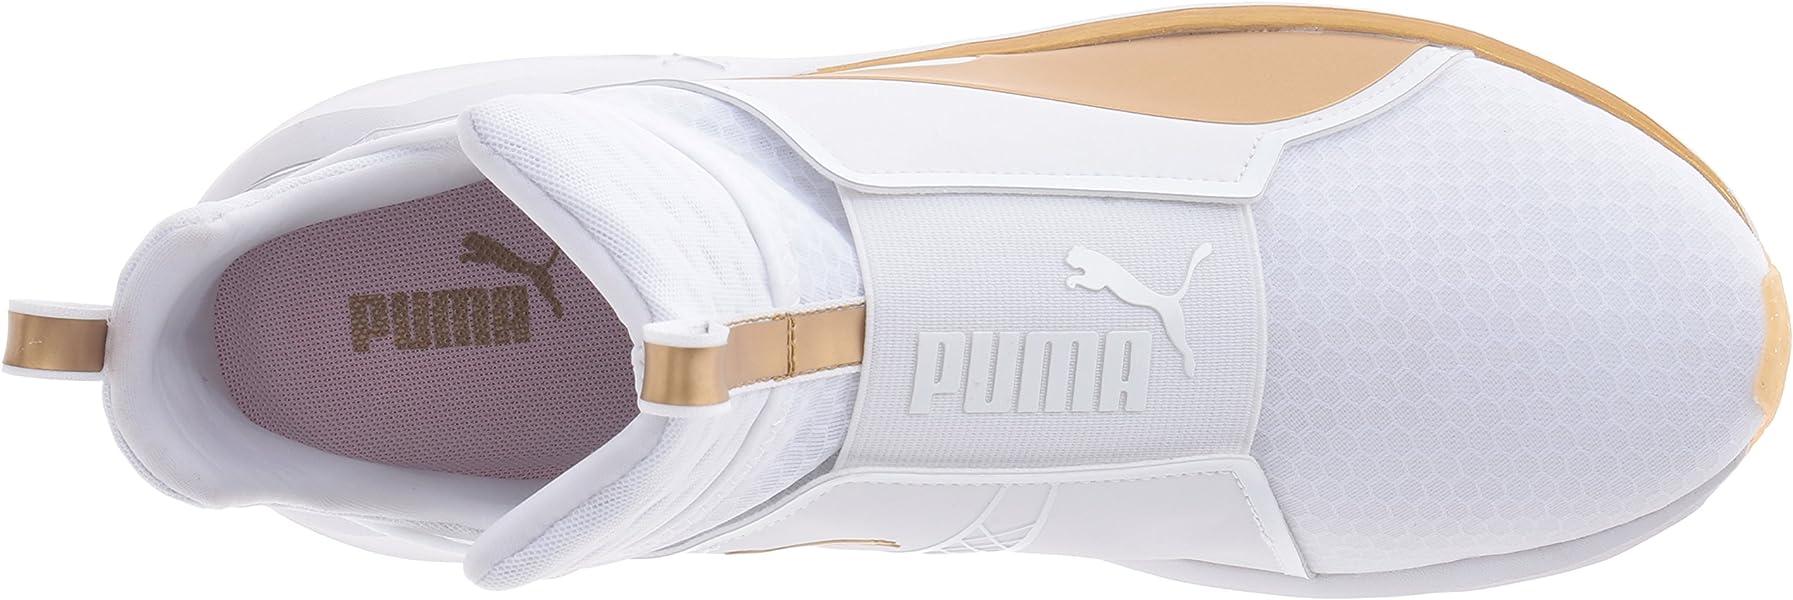 32338a844cdc PUMA Women s Fierce White Gold Cross-Trainer Shoe